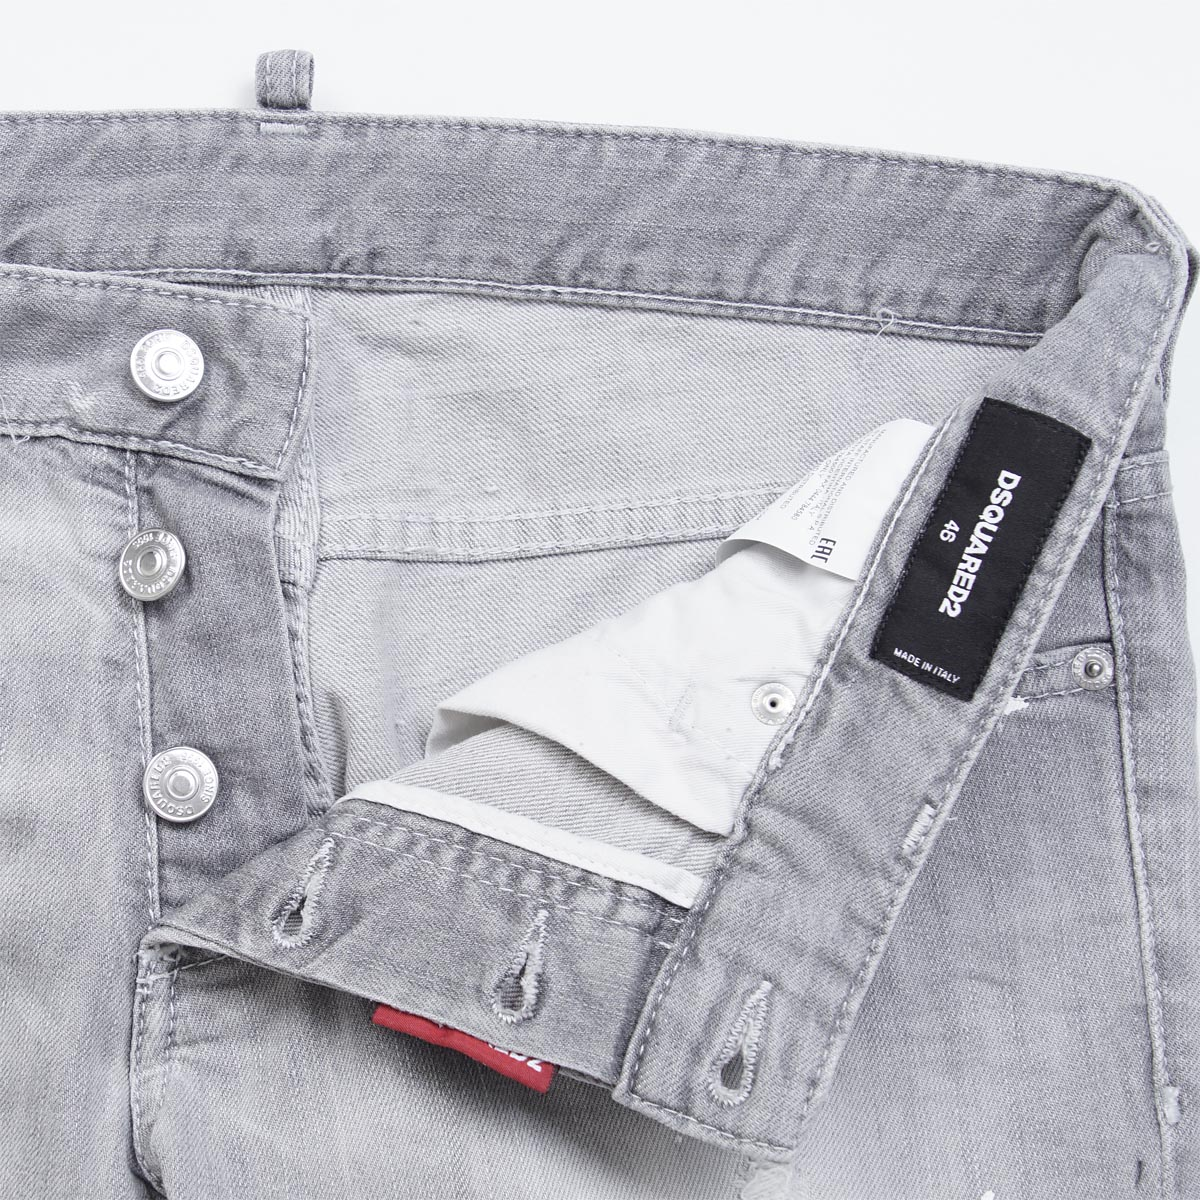 disukueado DSQUARED2按钮油炸食品牛仔裤SLIM JEAN纤细灰色灰色派s74lb0122 s30260 852人